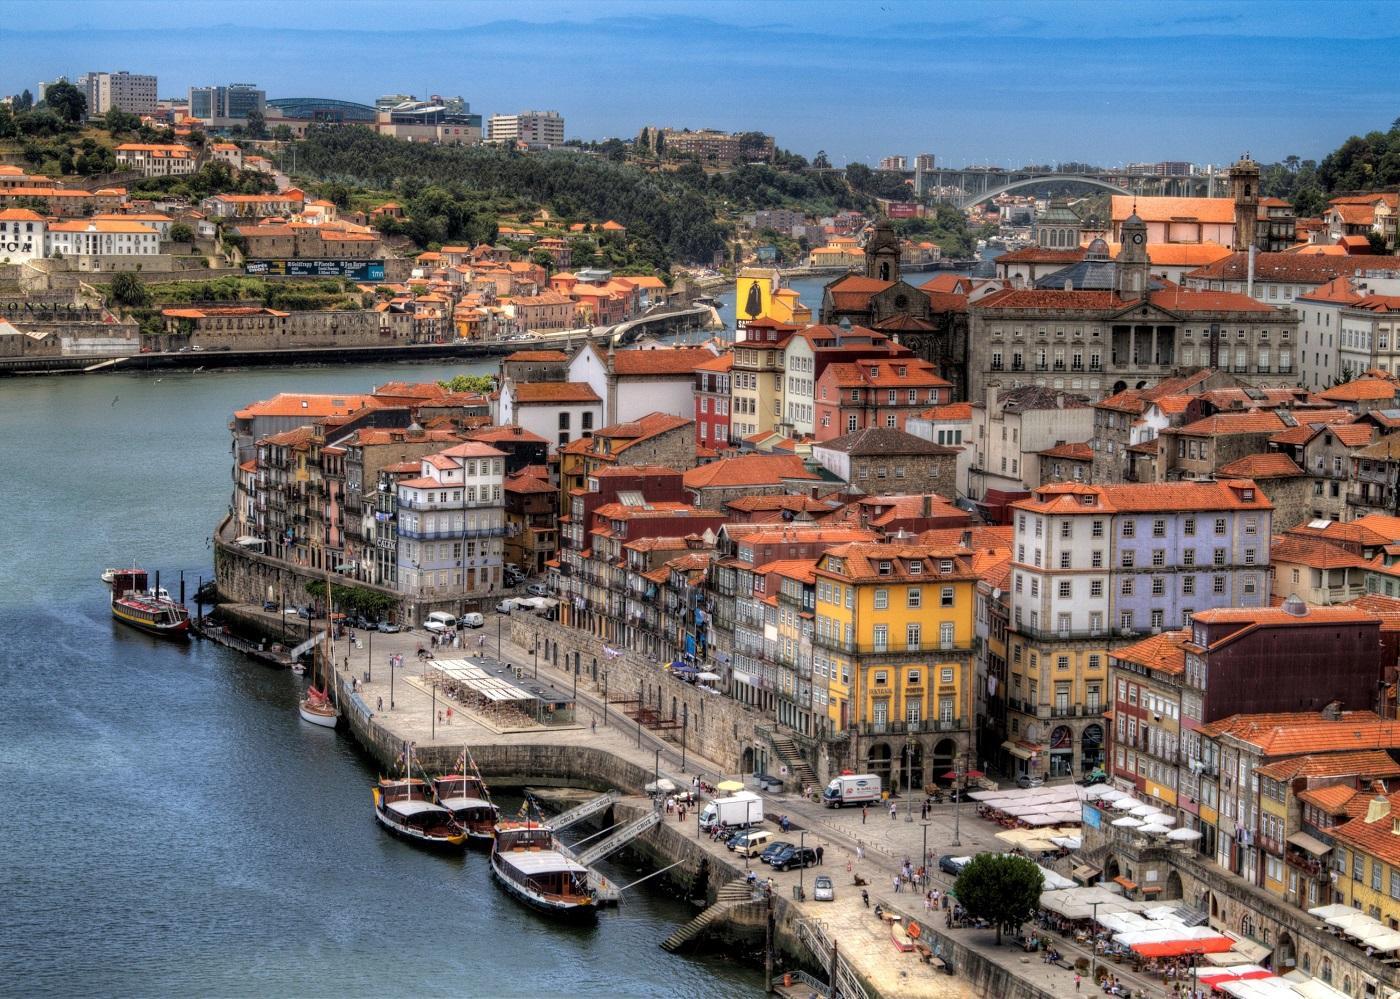 ВНЖ Португалии при покупке недвижимости